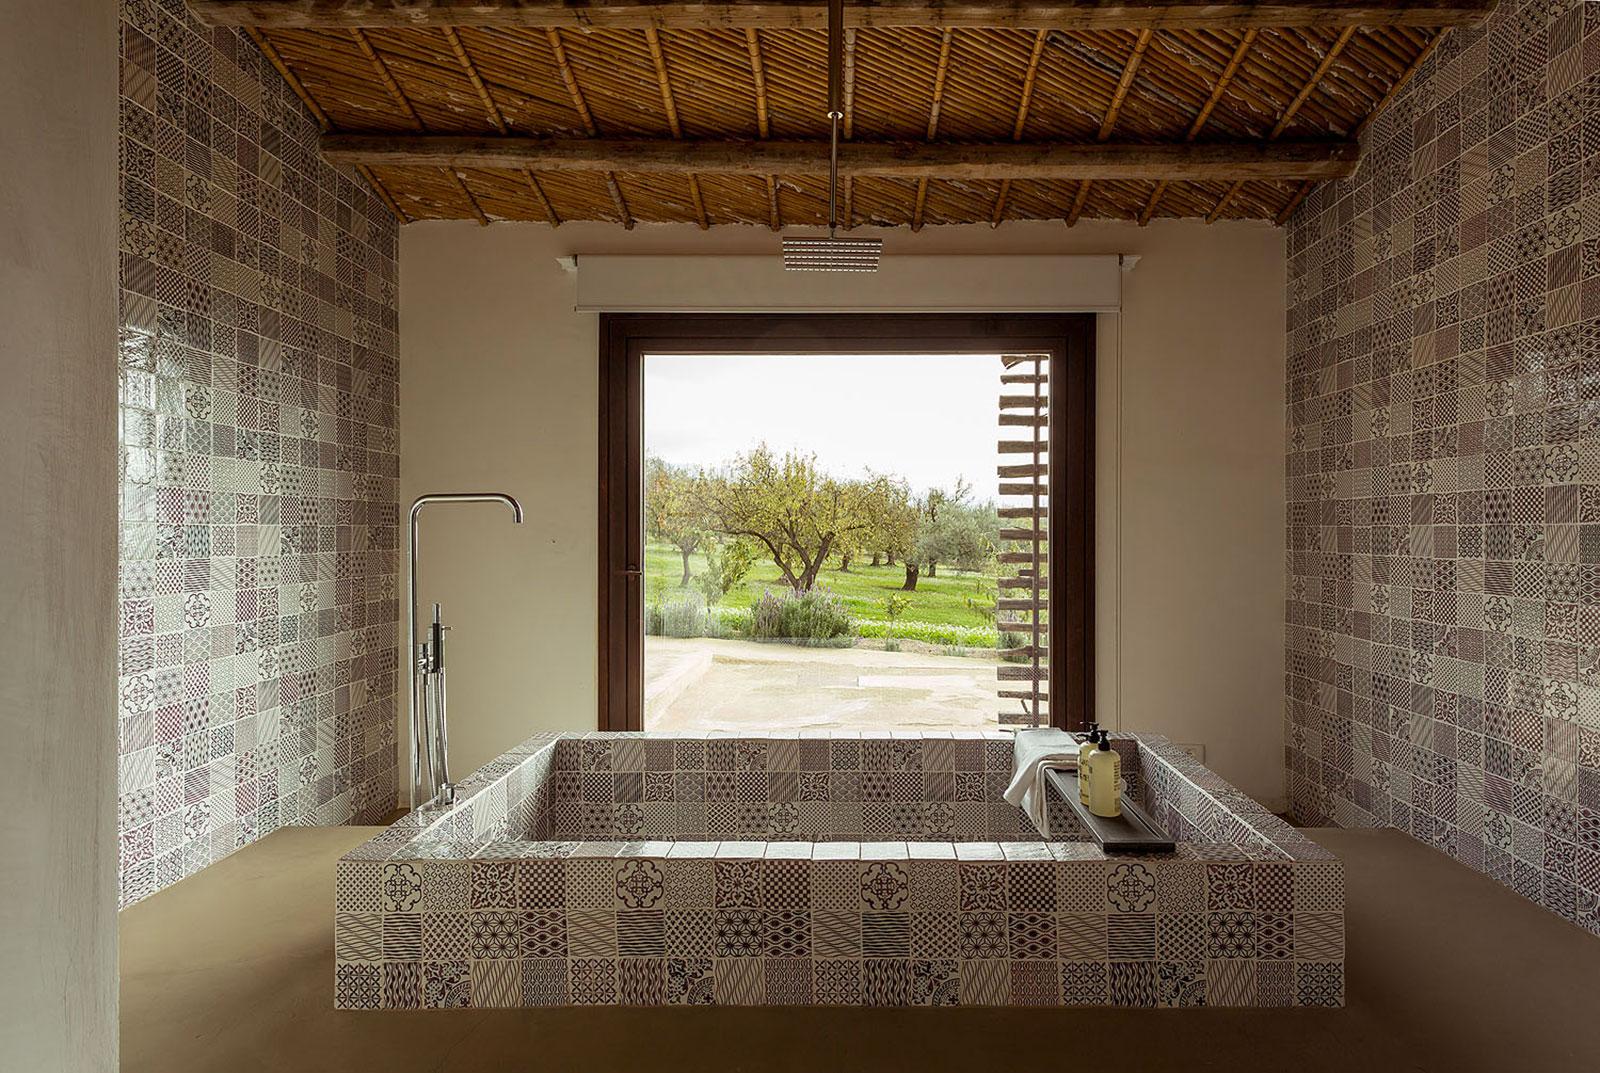 2015 – N-orma – Chiaramonte Gulfi – Arch. Patrizia Sbalchiero – Patchwork of Novecento + Komon Collection + Nuda Lava